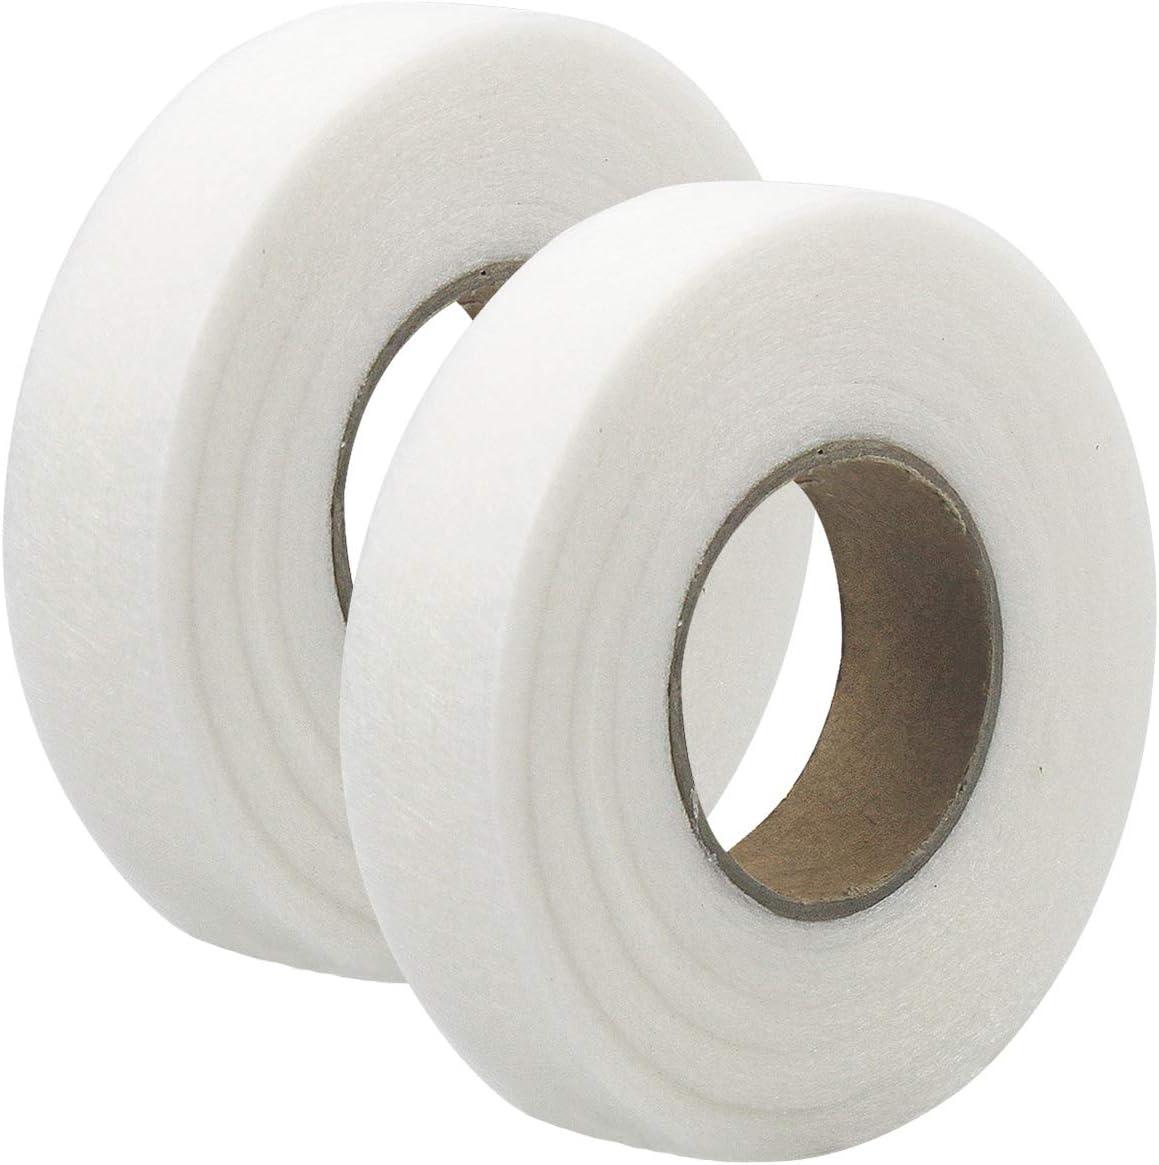 Netspower 140 Yard Iron On Hem Tape Hemming Web Tape Fabric Fusing Tape Adhesive Iron-on Tape White No Sewing Hem Tape for Clothes Jeans Seaming Bonding